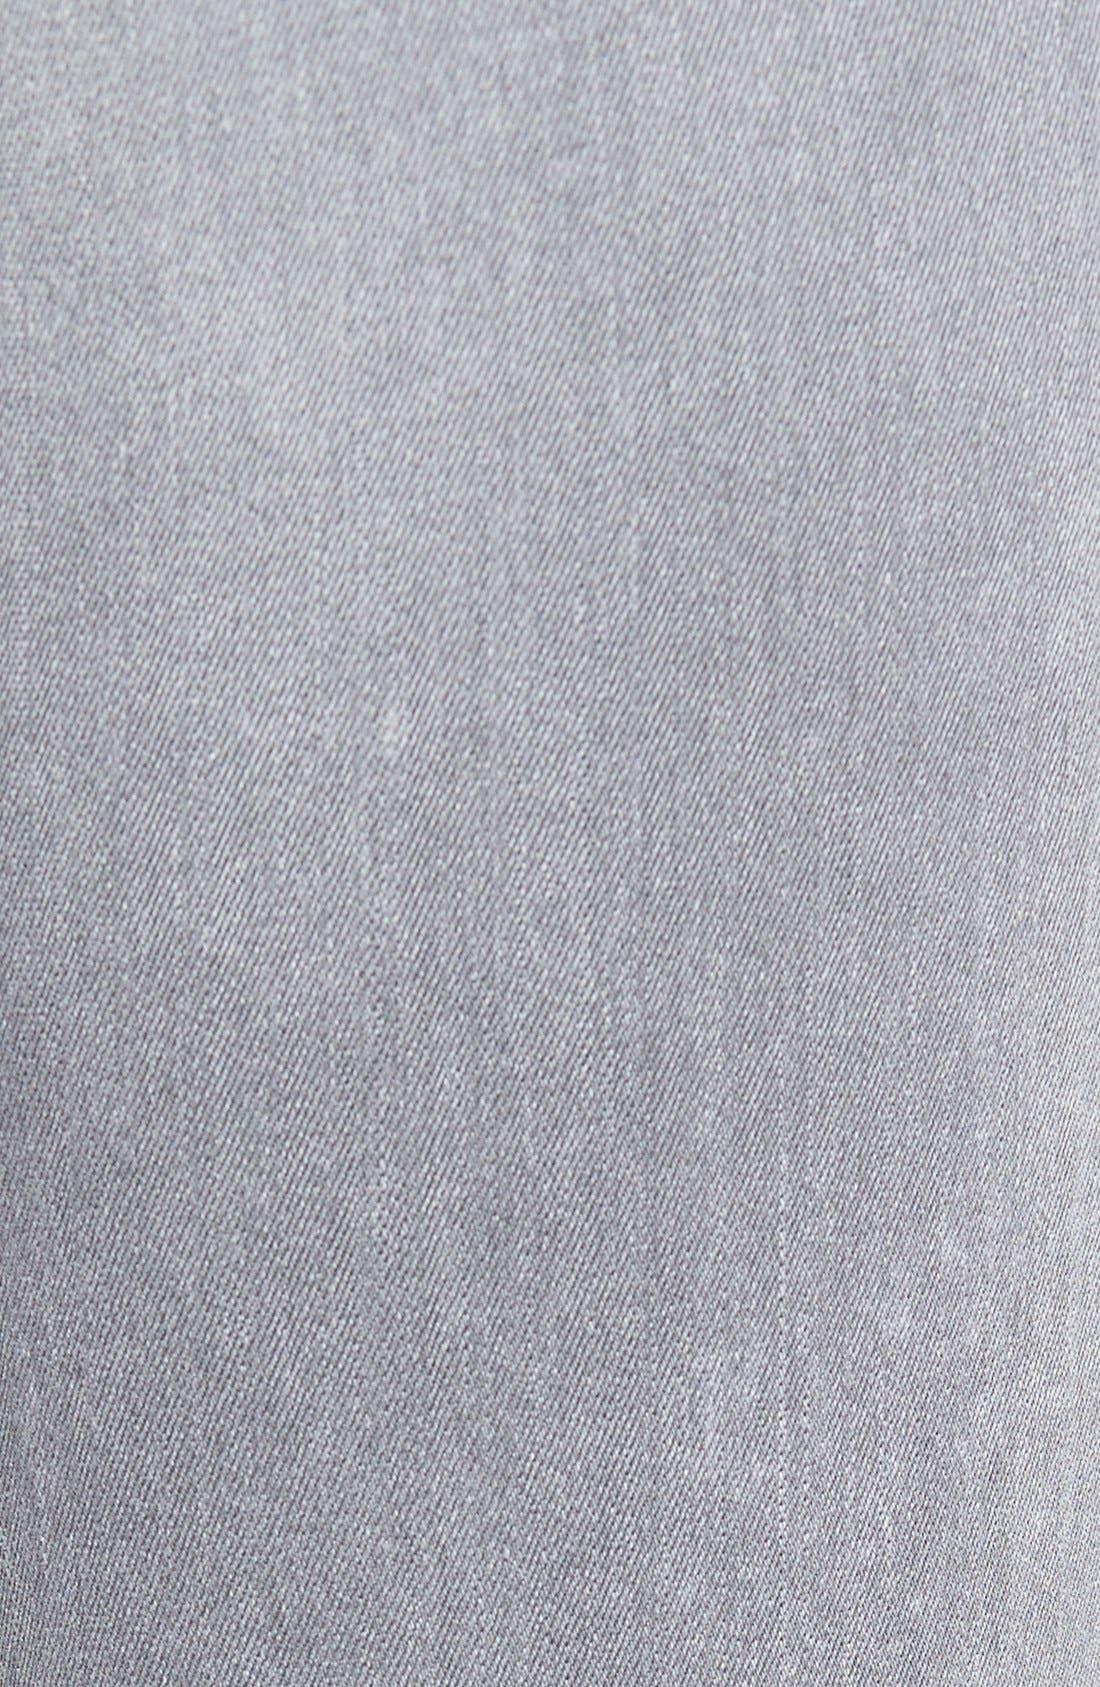 'Sculpt - Rocket' High Rise Skinny Jeans,                             Alternate thumbnail 2, color,                             078